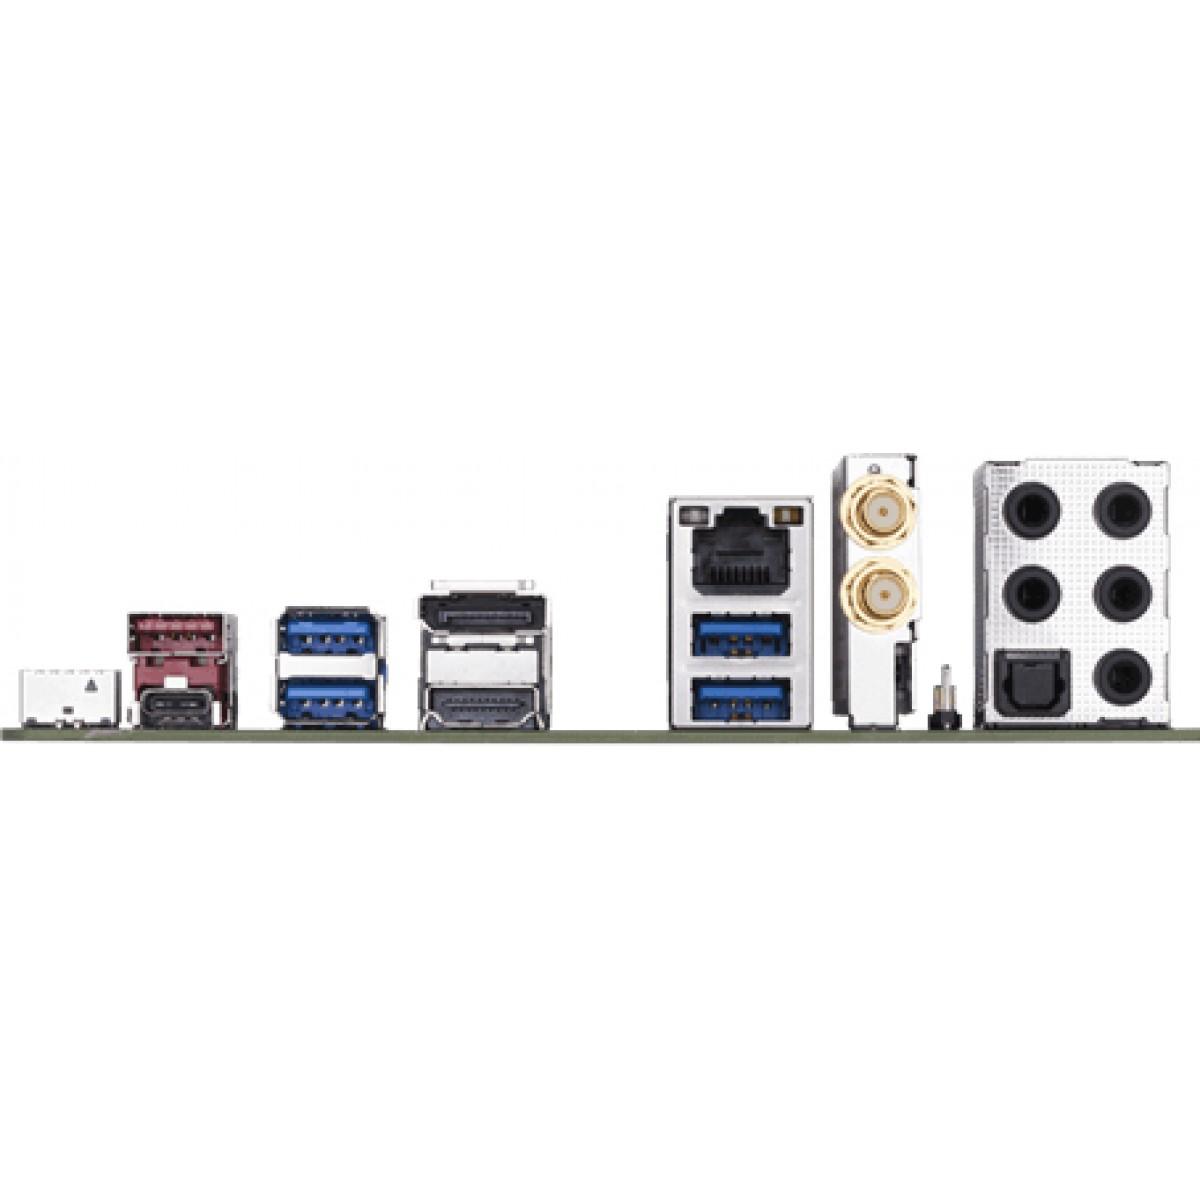 Placa Mãe Gigabyte Z390 I Aorus Pro Wifi, Chipset Z390, Intel LGA 1151, m-ITX, DDR4